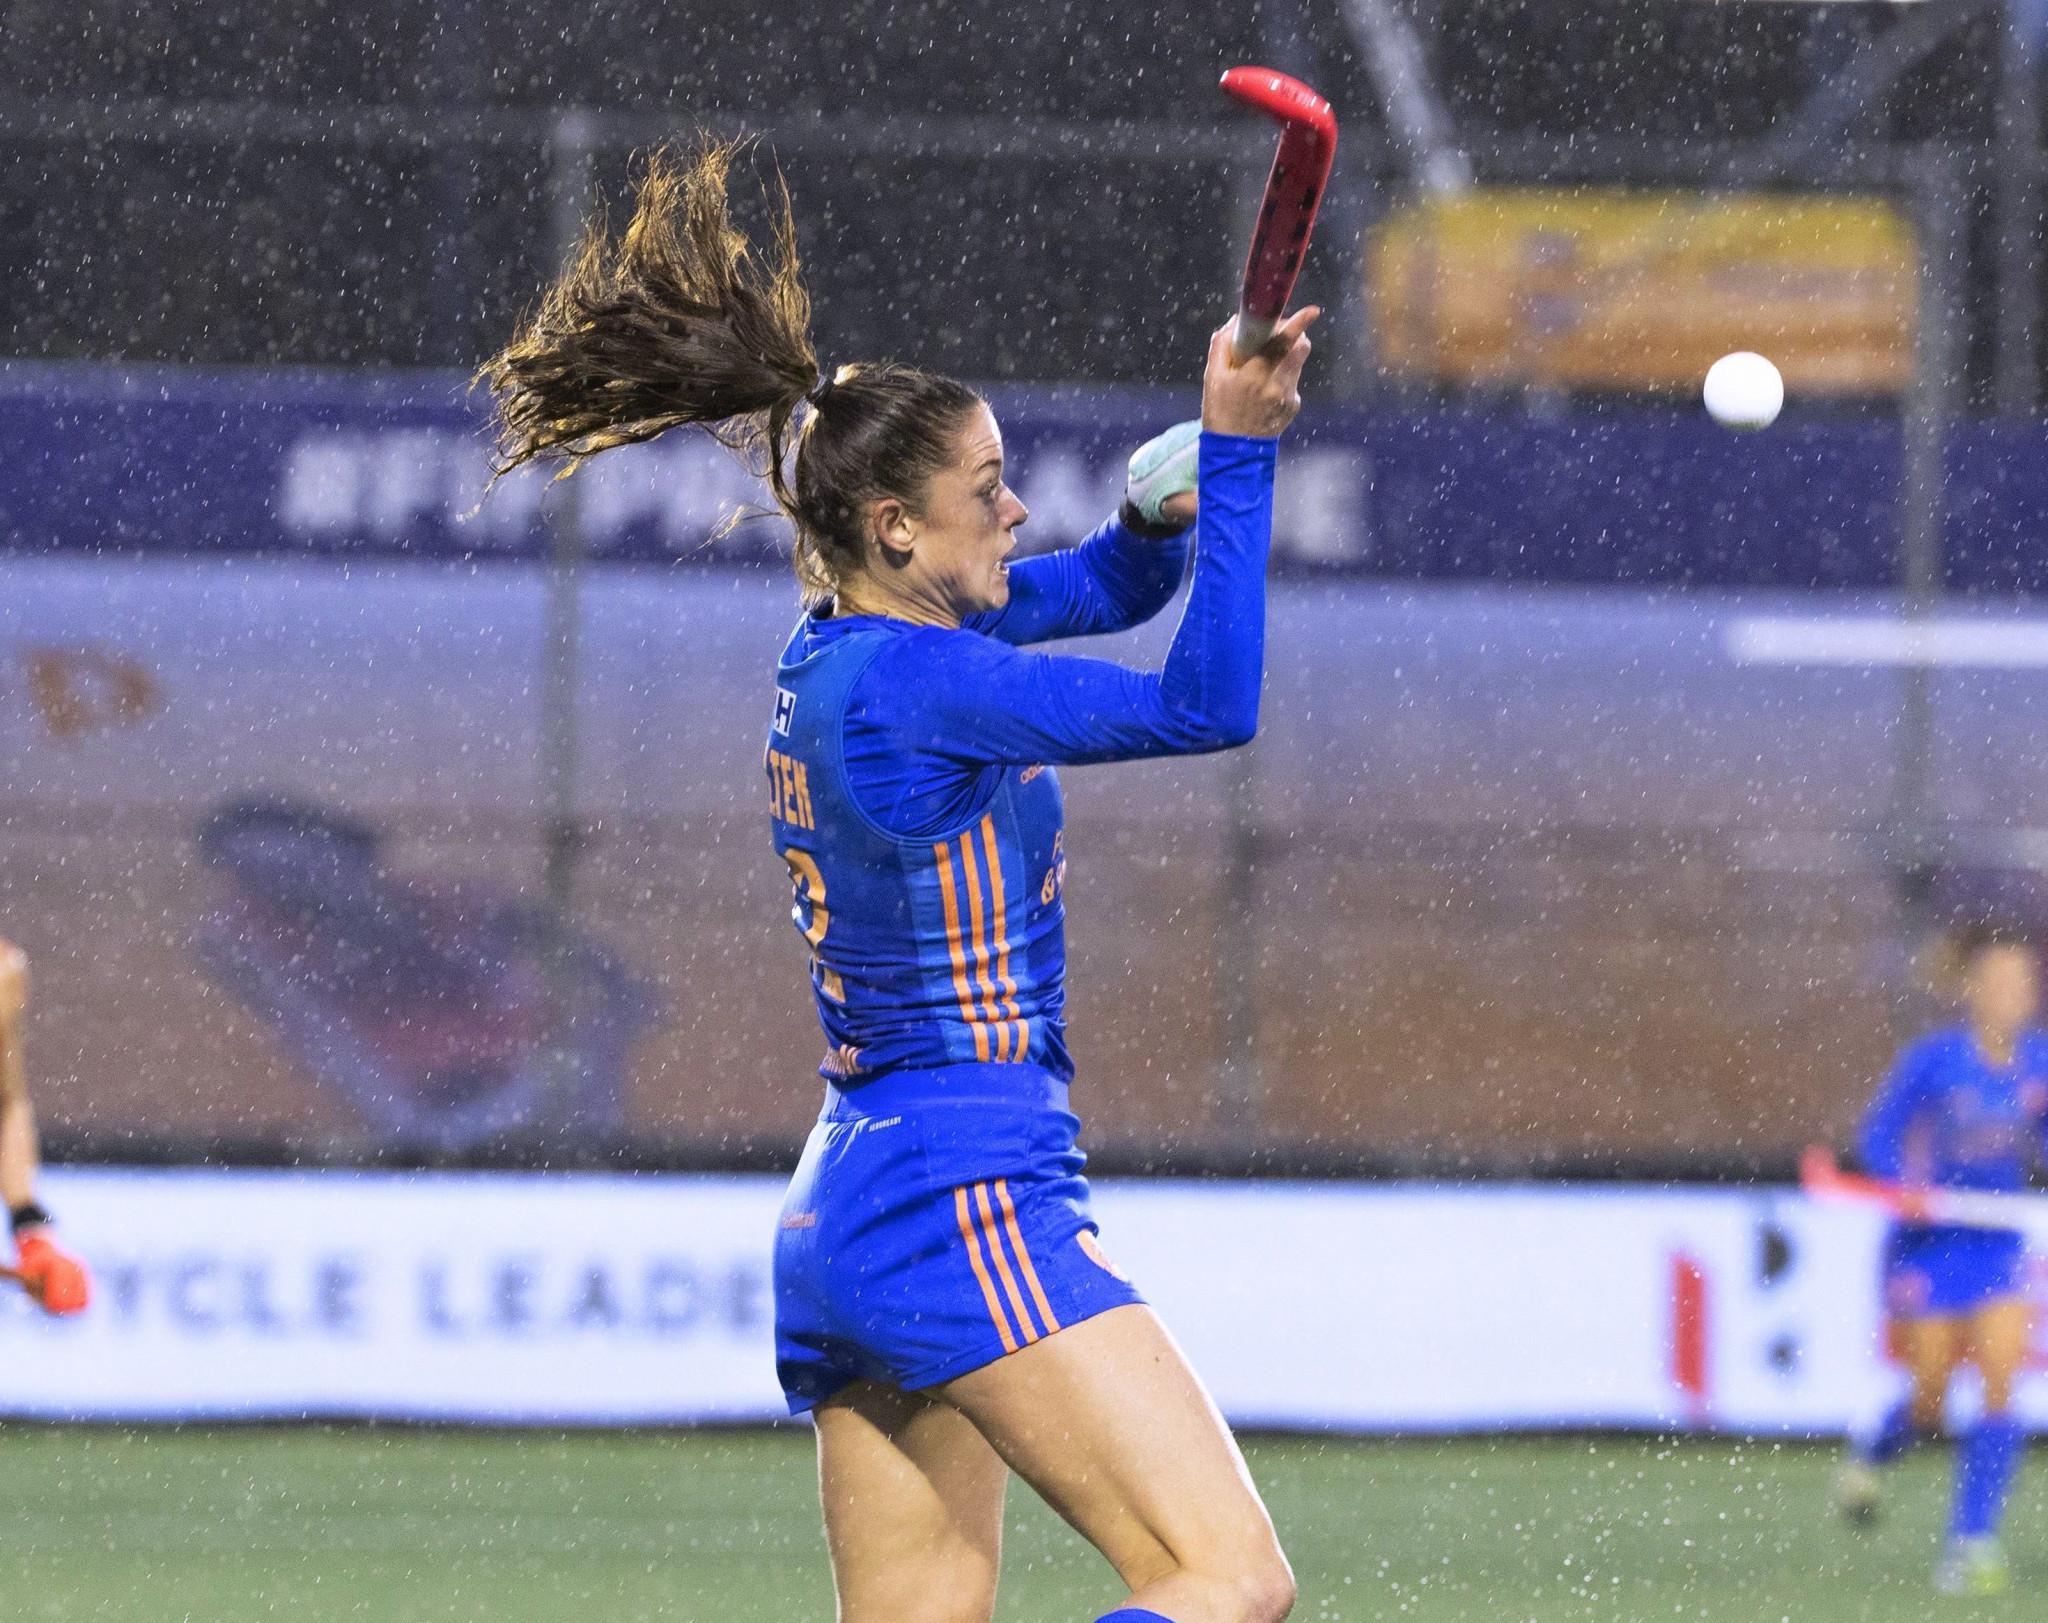 Lidewij Welten opened the scoring in the women's match ©Getty Images